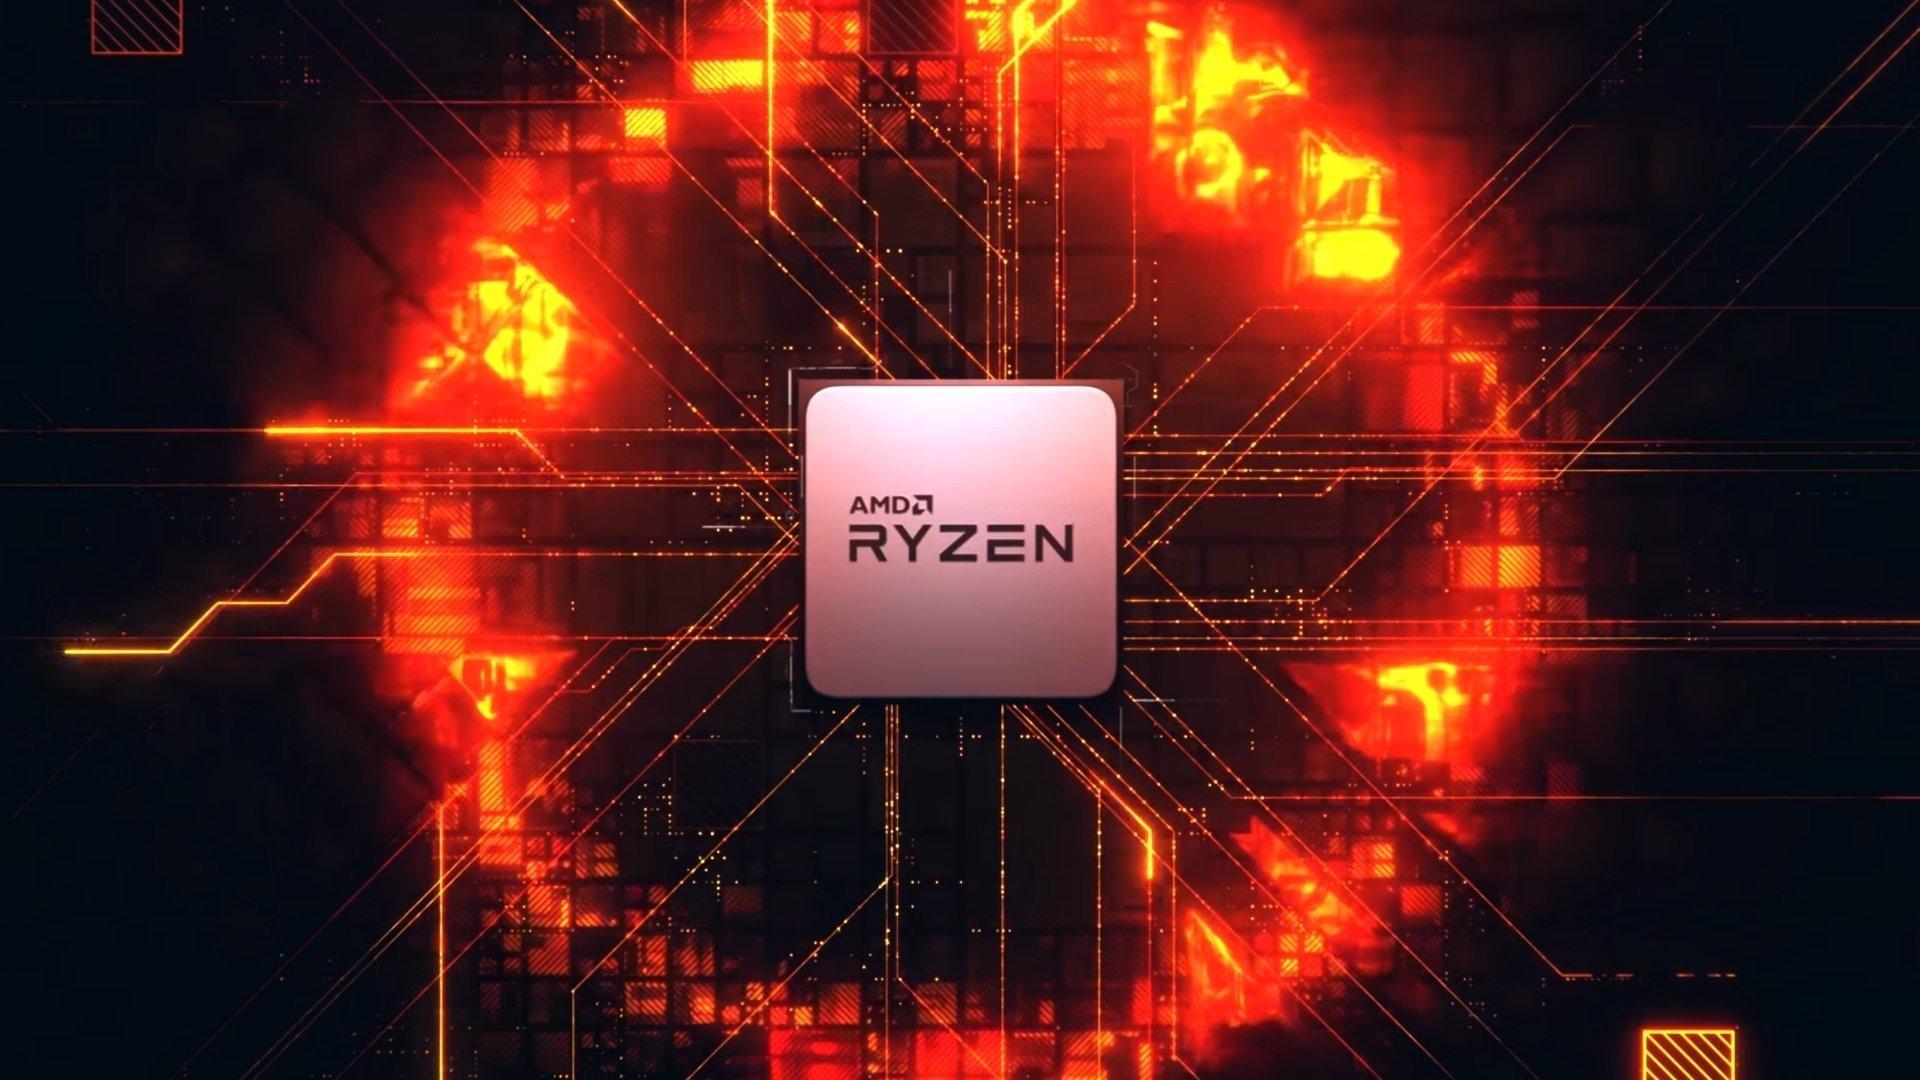 AMD ryzen processadores